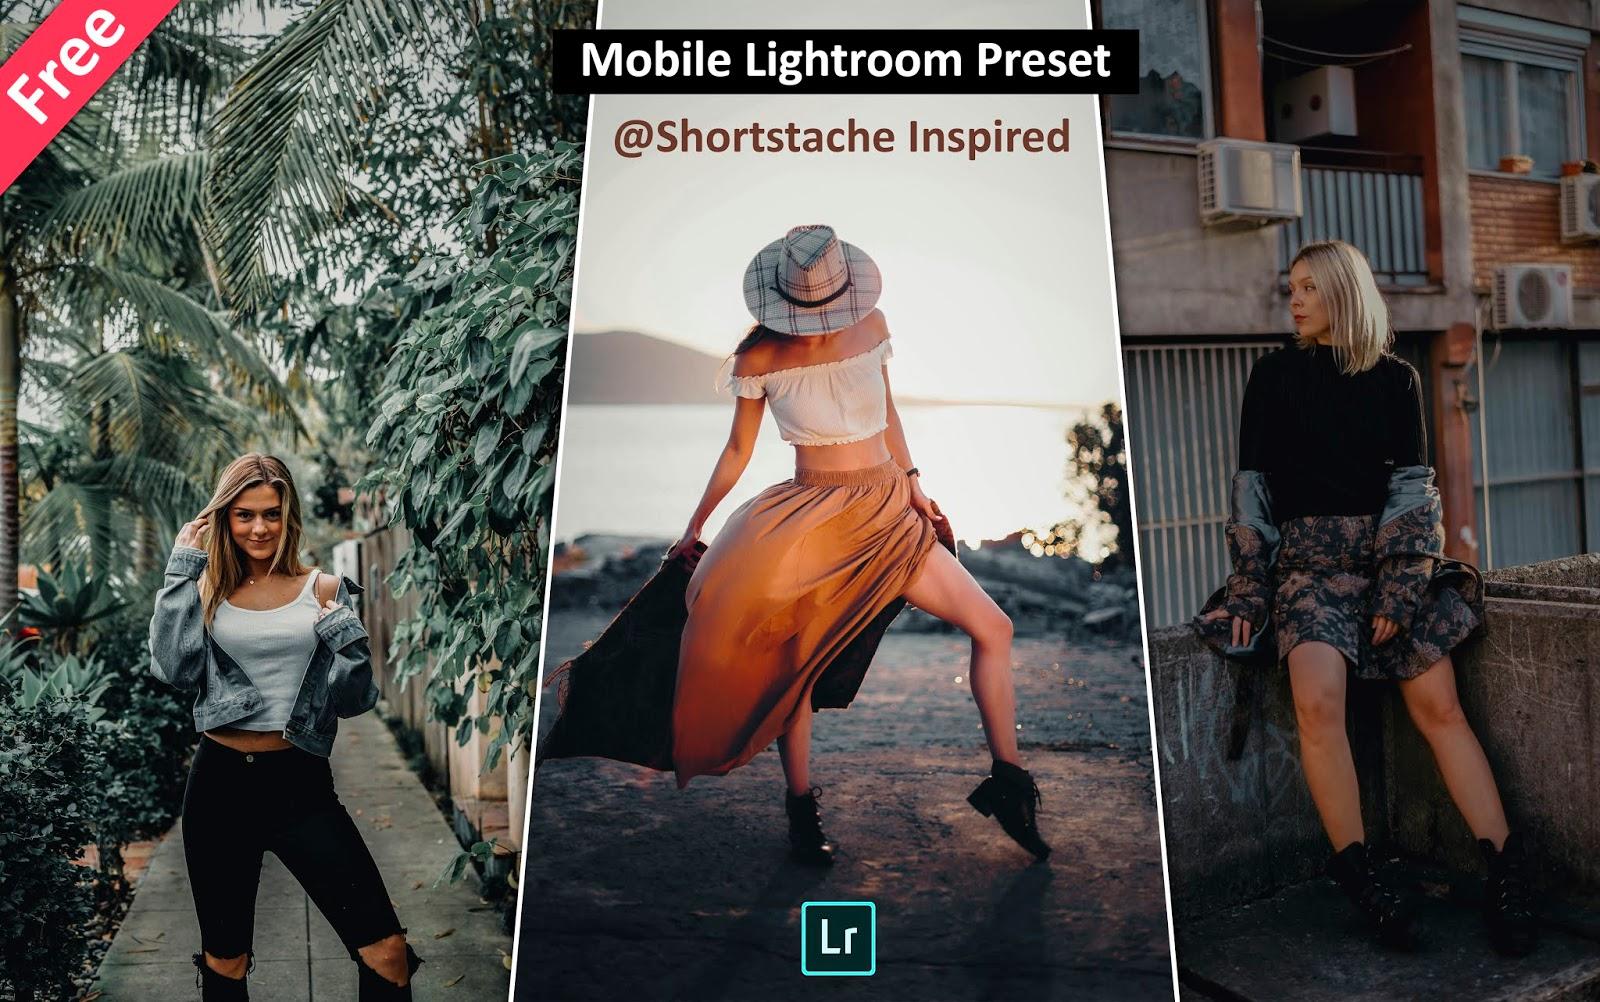 Download Shortstache Inspired Mobile Lightroom Presets for